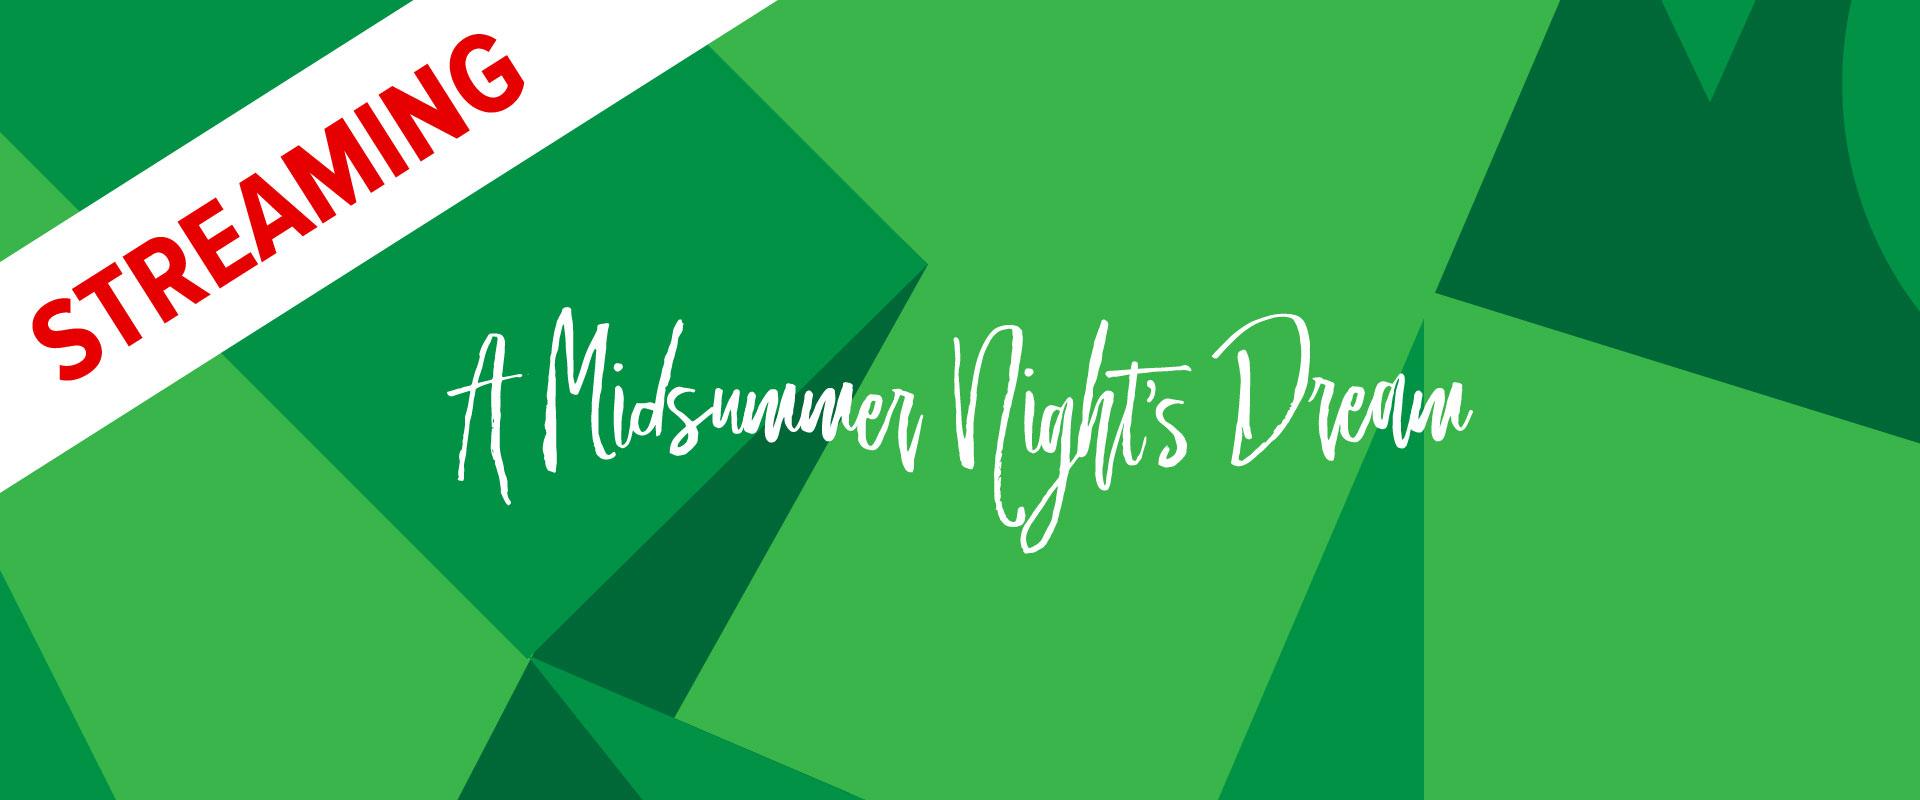 Wordmark image of A Midsummer Night's Dream Waiting List